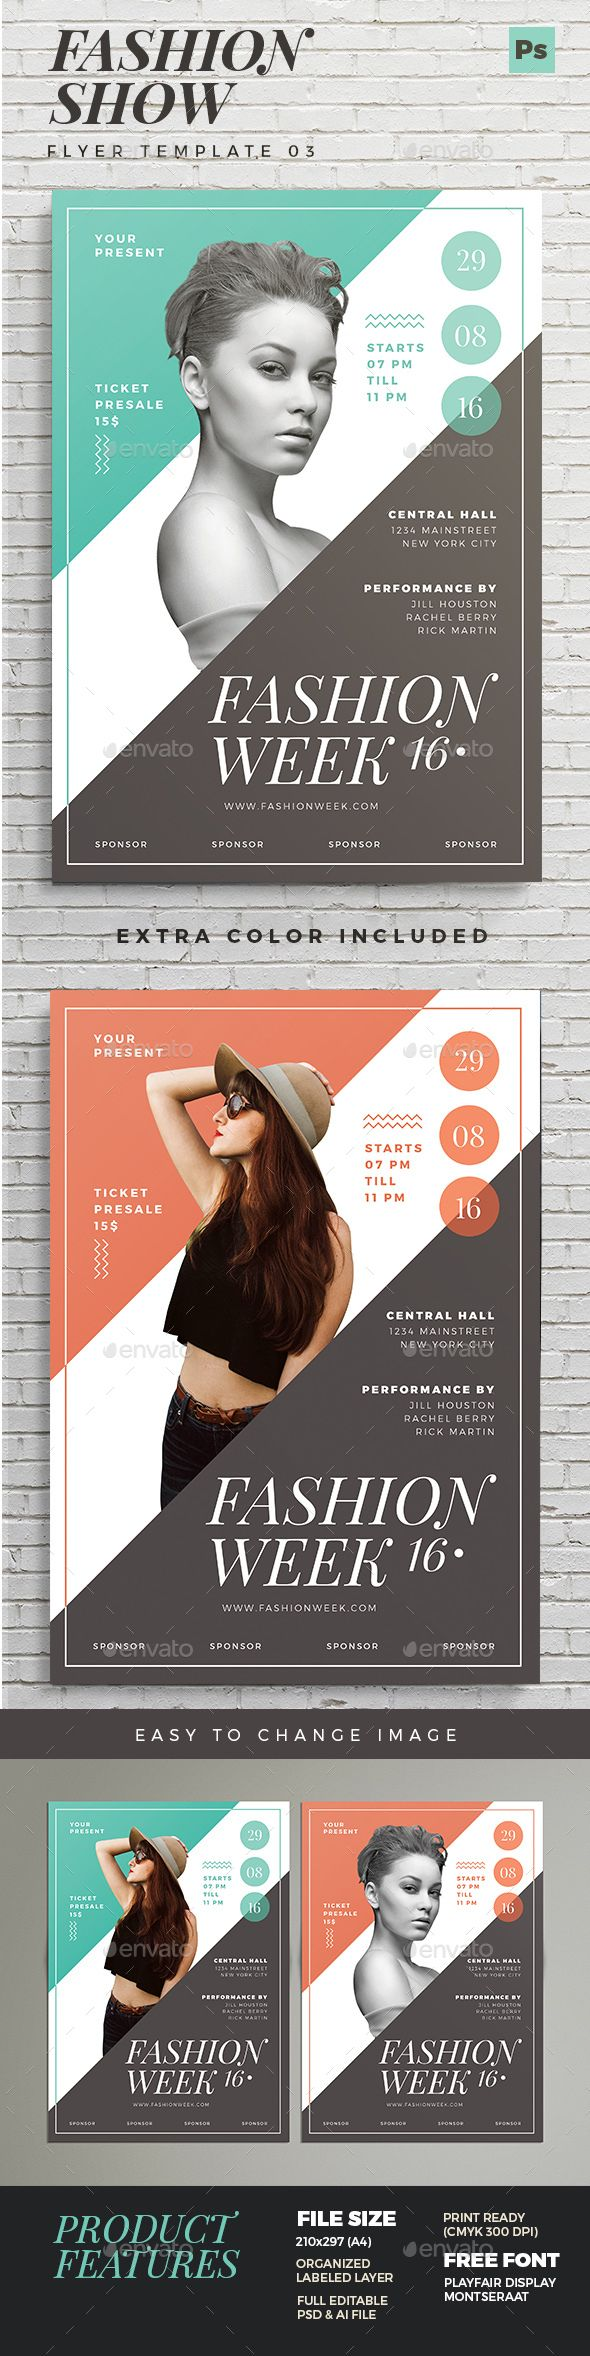 25 best ideas about Flyer Design on Pinterest  Graphic design flyer Flyer layout and Flyer